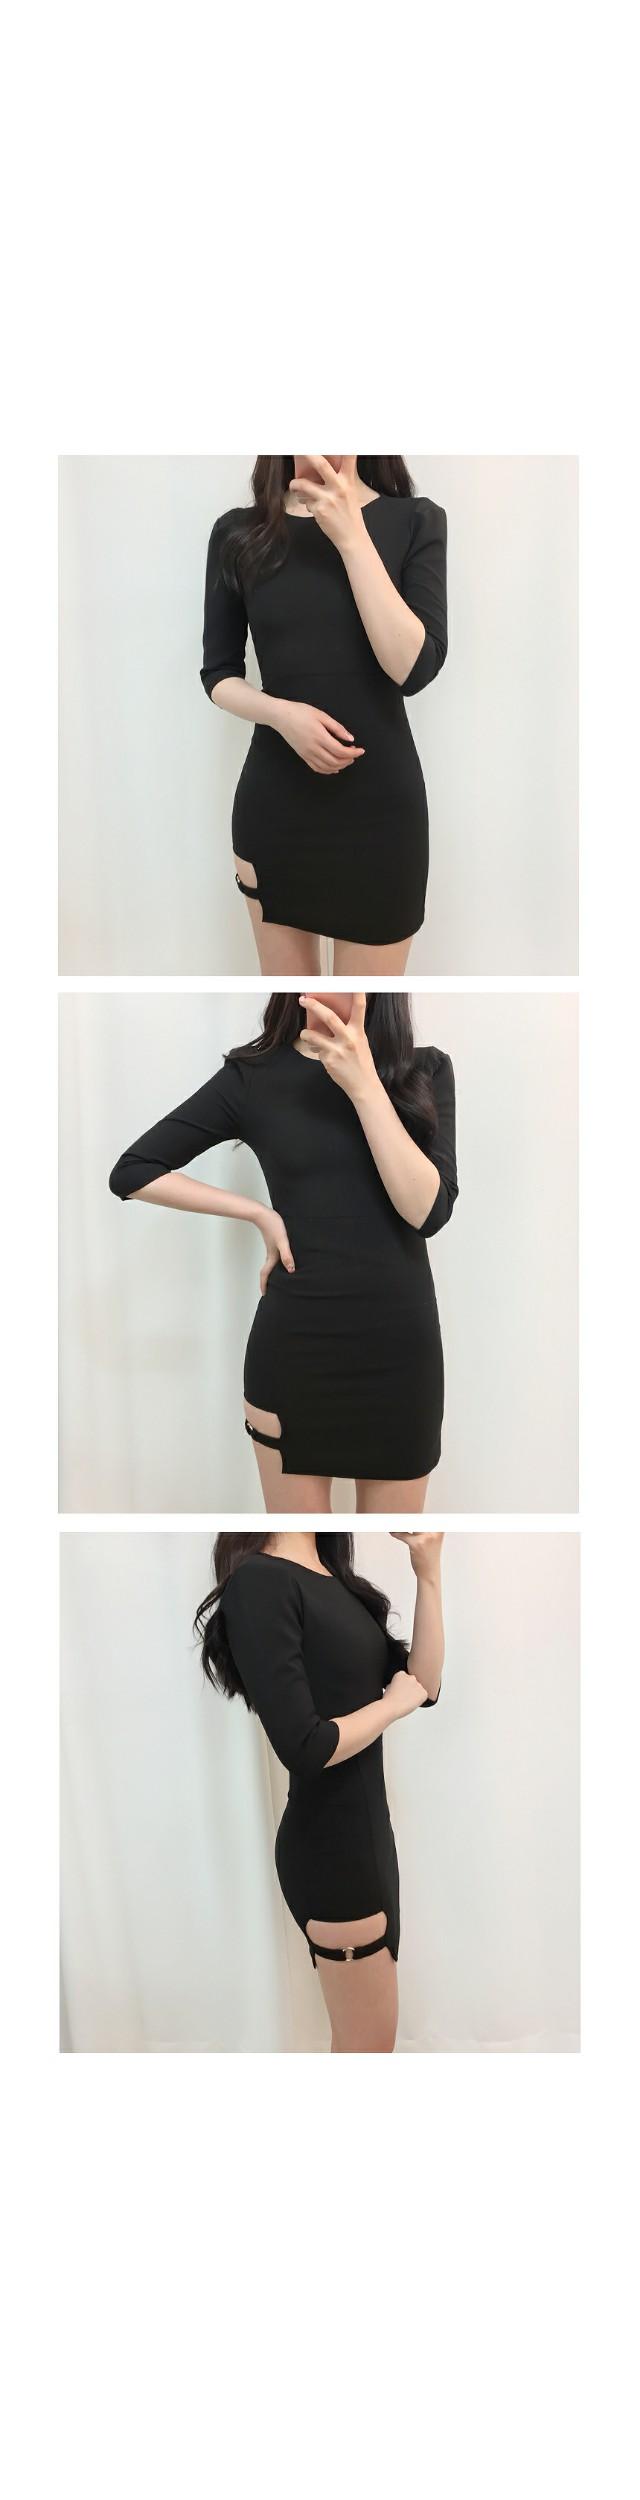 Spring version ♥ Garter belt ring dress